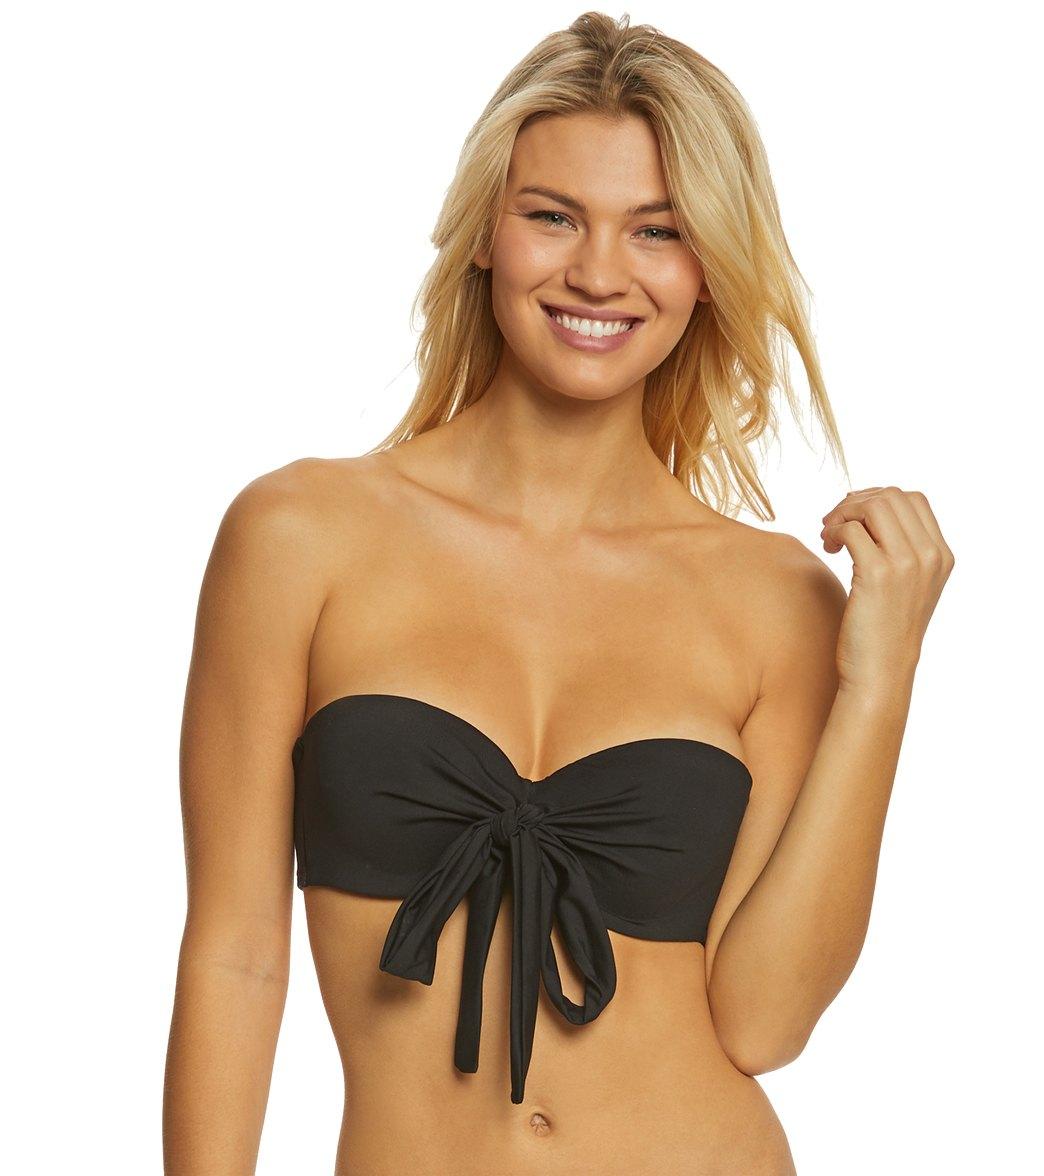 73a696d742 Coco Reef Classic Solid Five Way Convertible Bikini Top (C D DD Cup ...